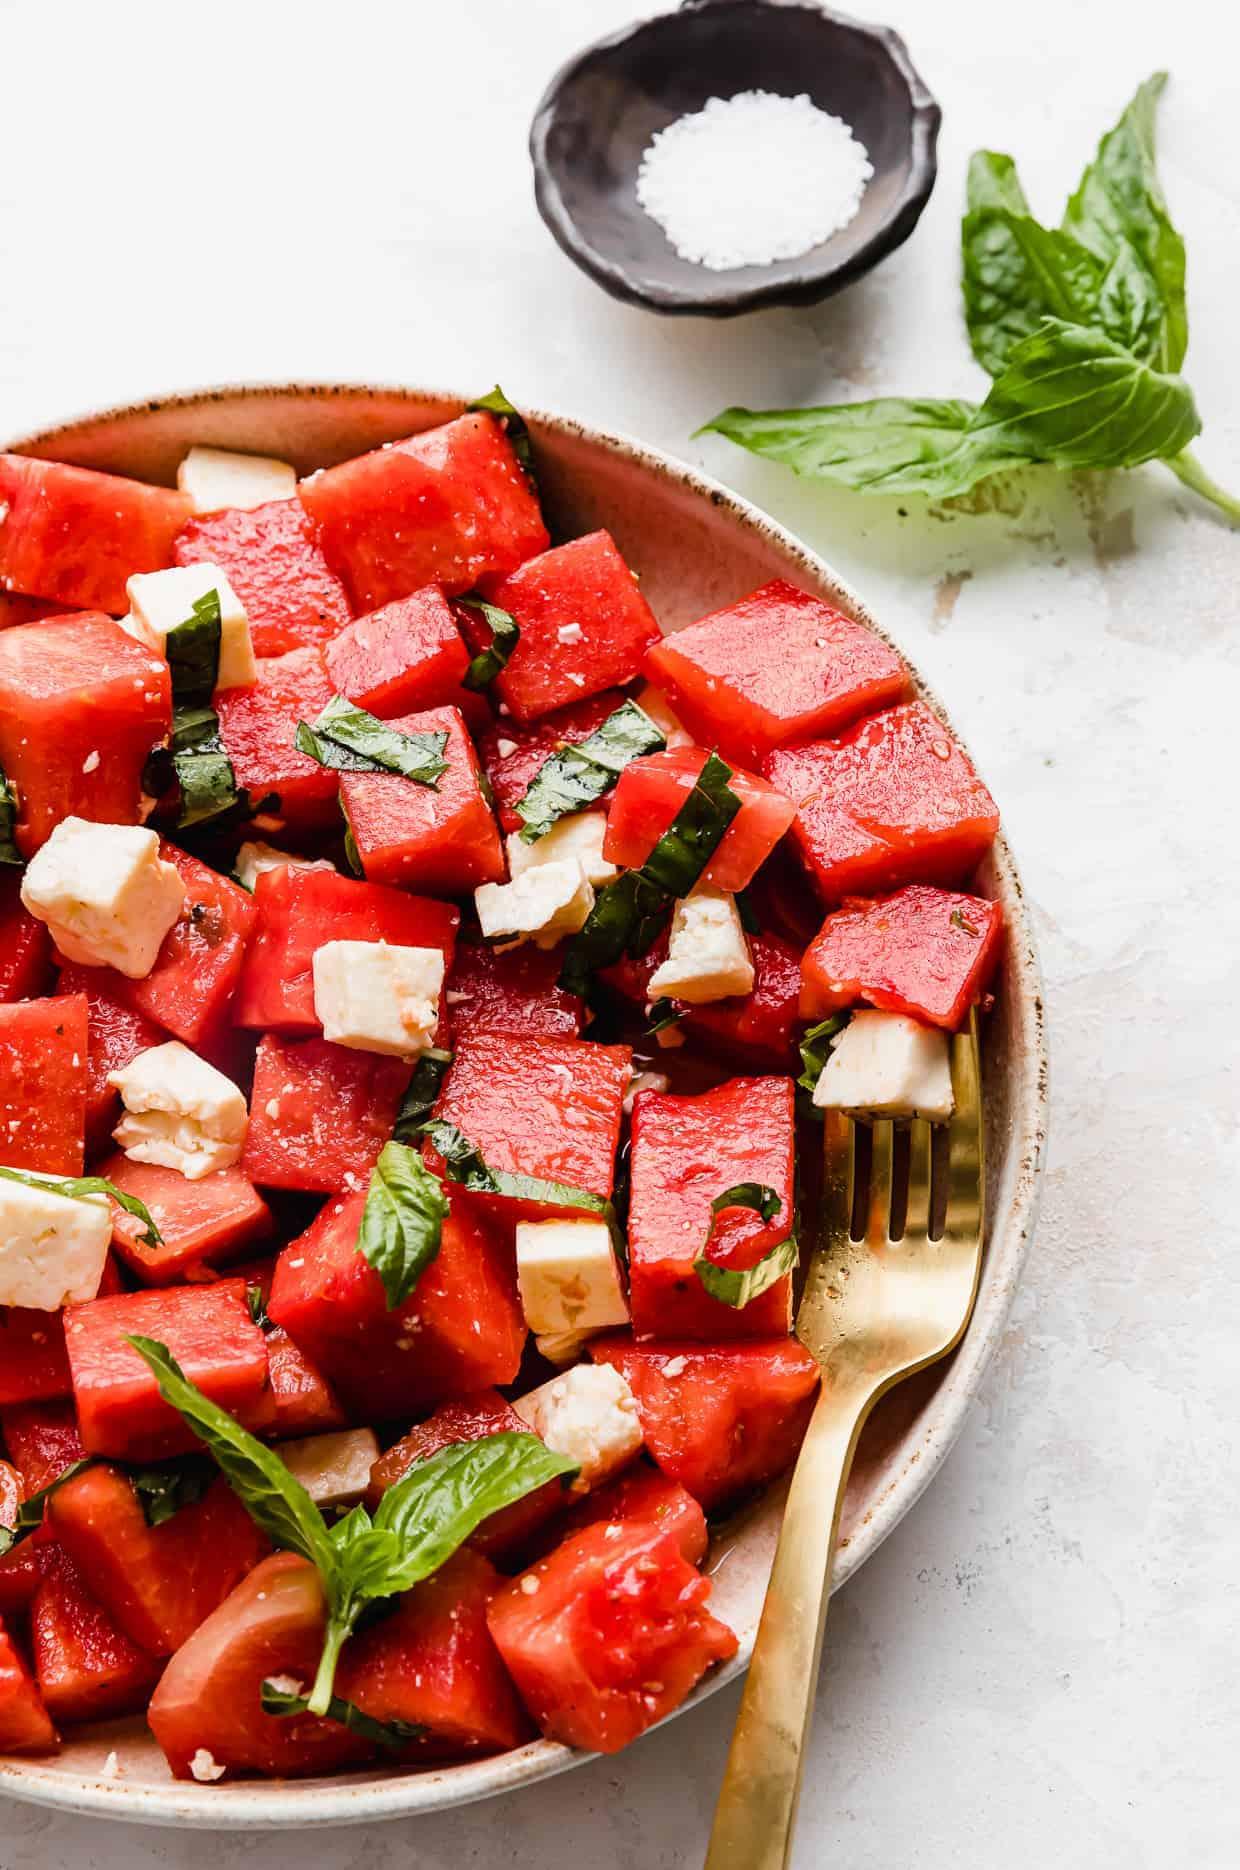 A close up photo of a cubed Watermelon Feta Basil Salad.